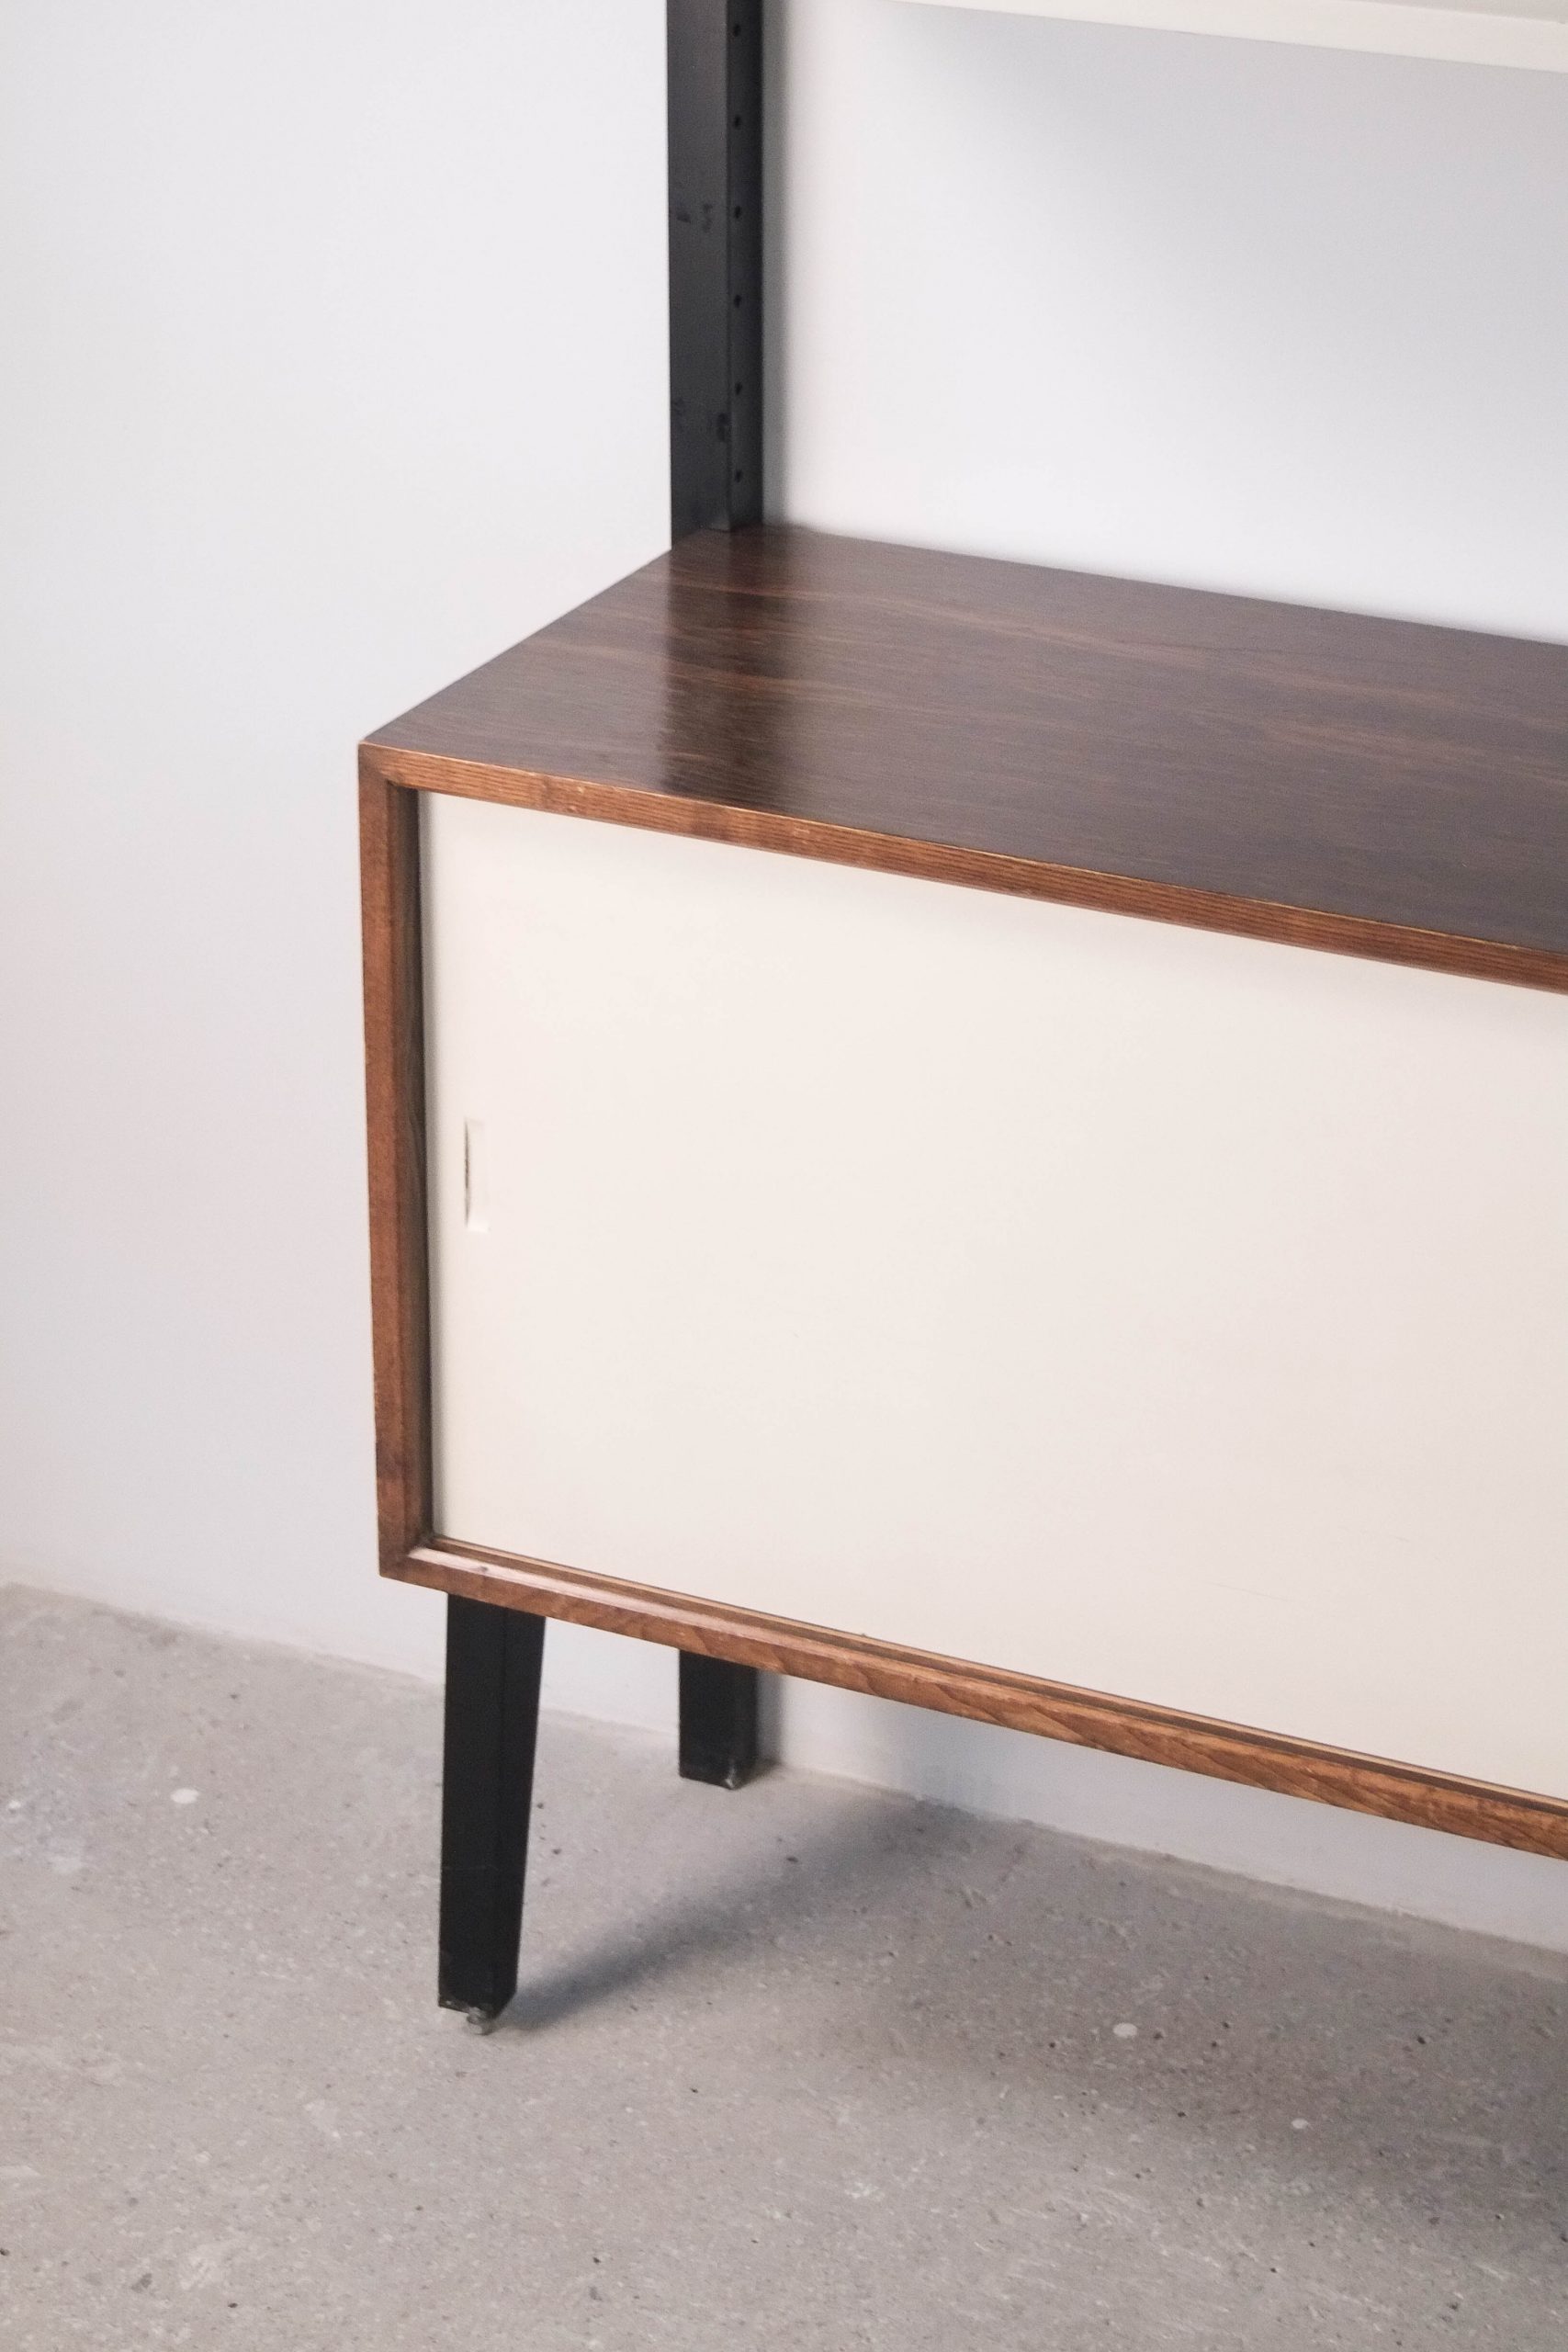 estantería modular martin visser de salon aparador almacenaje vintage palosanto palisandro